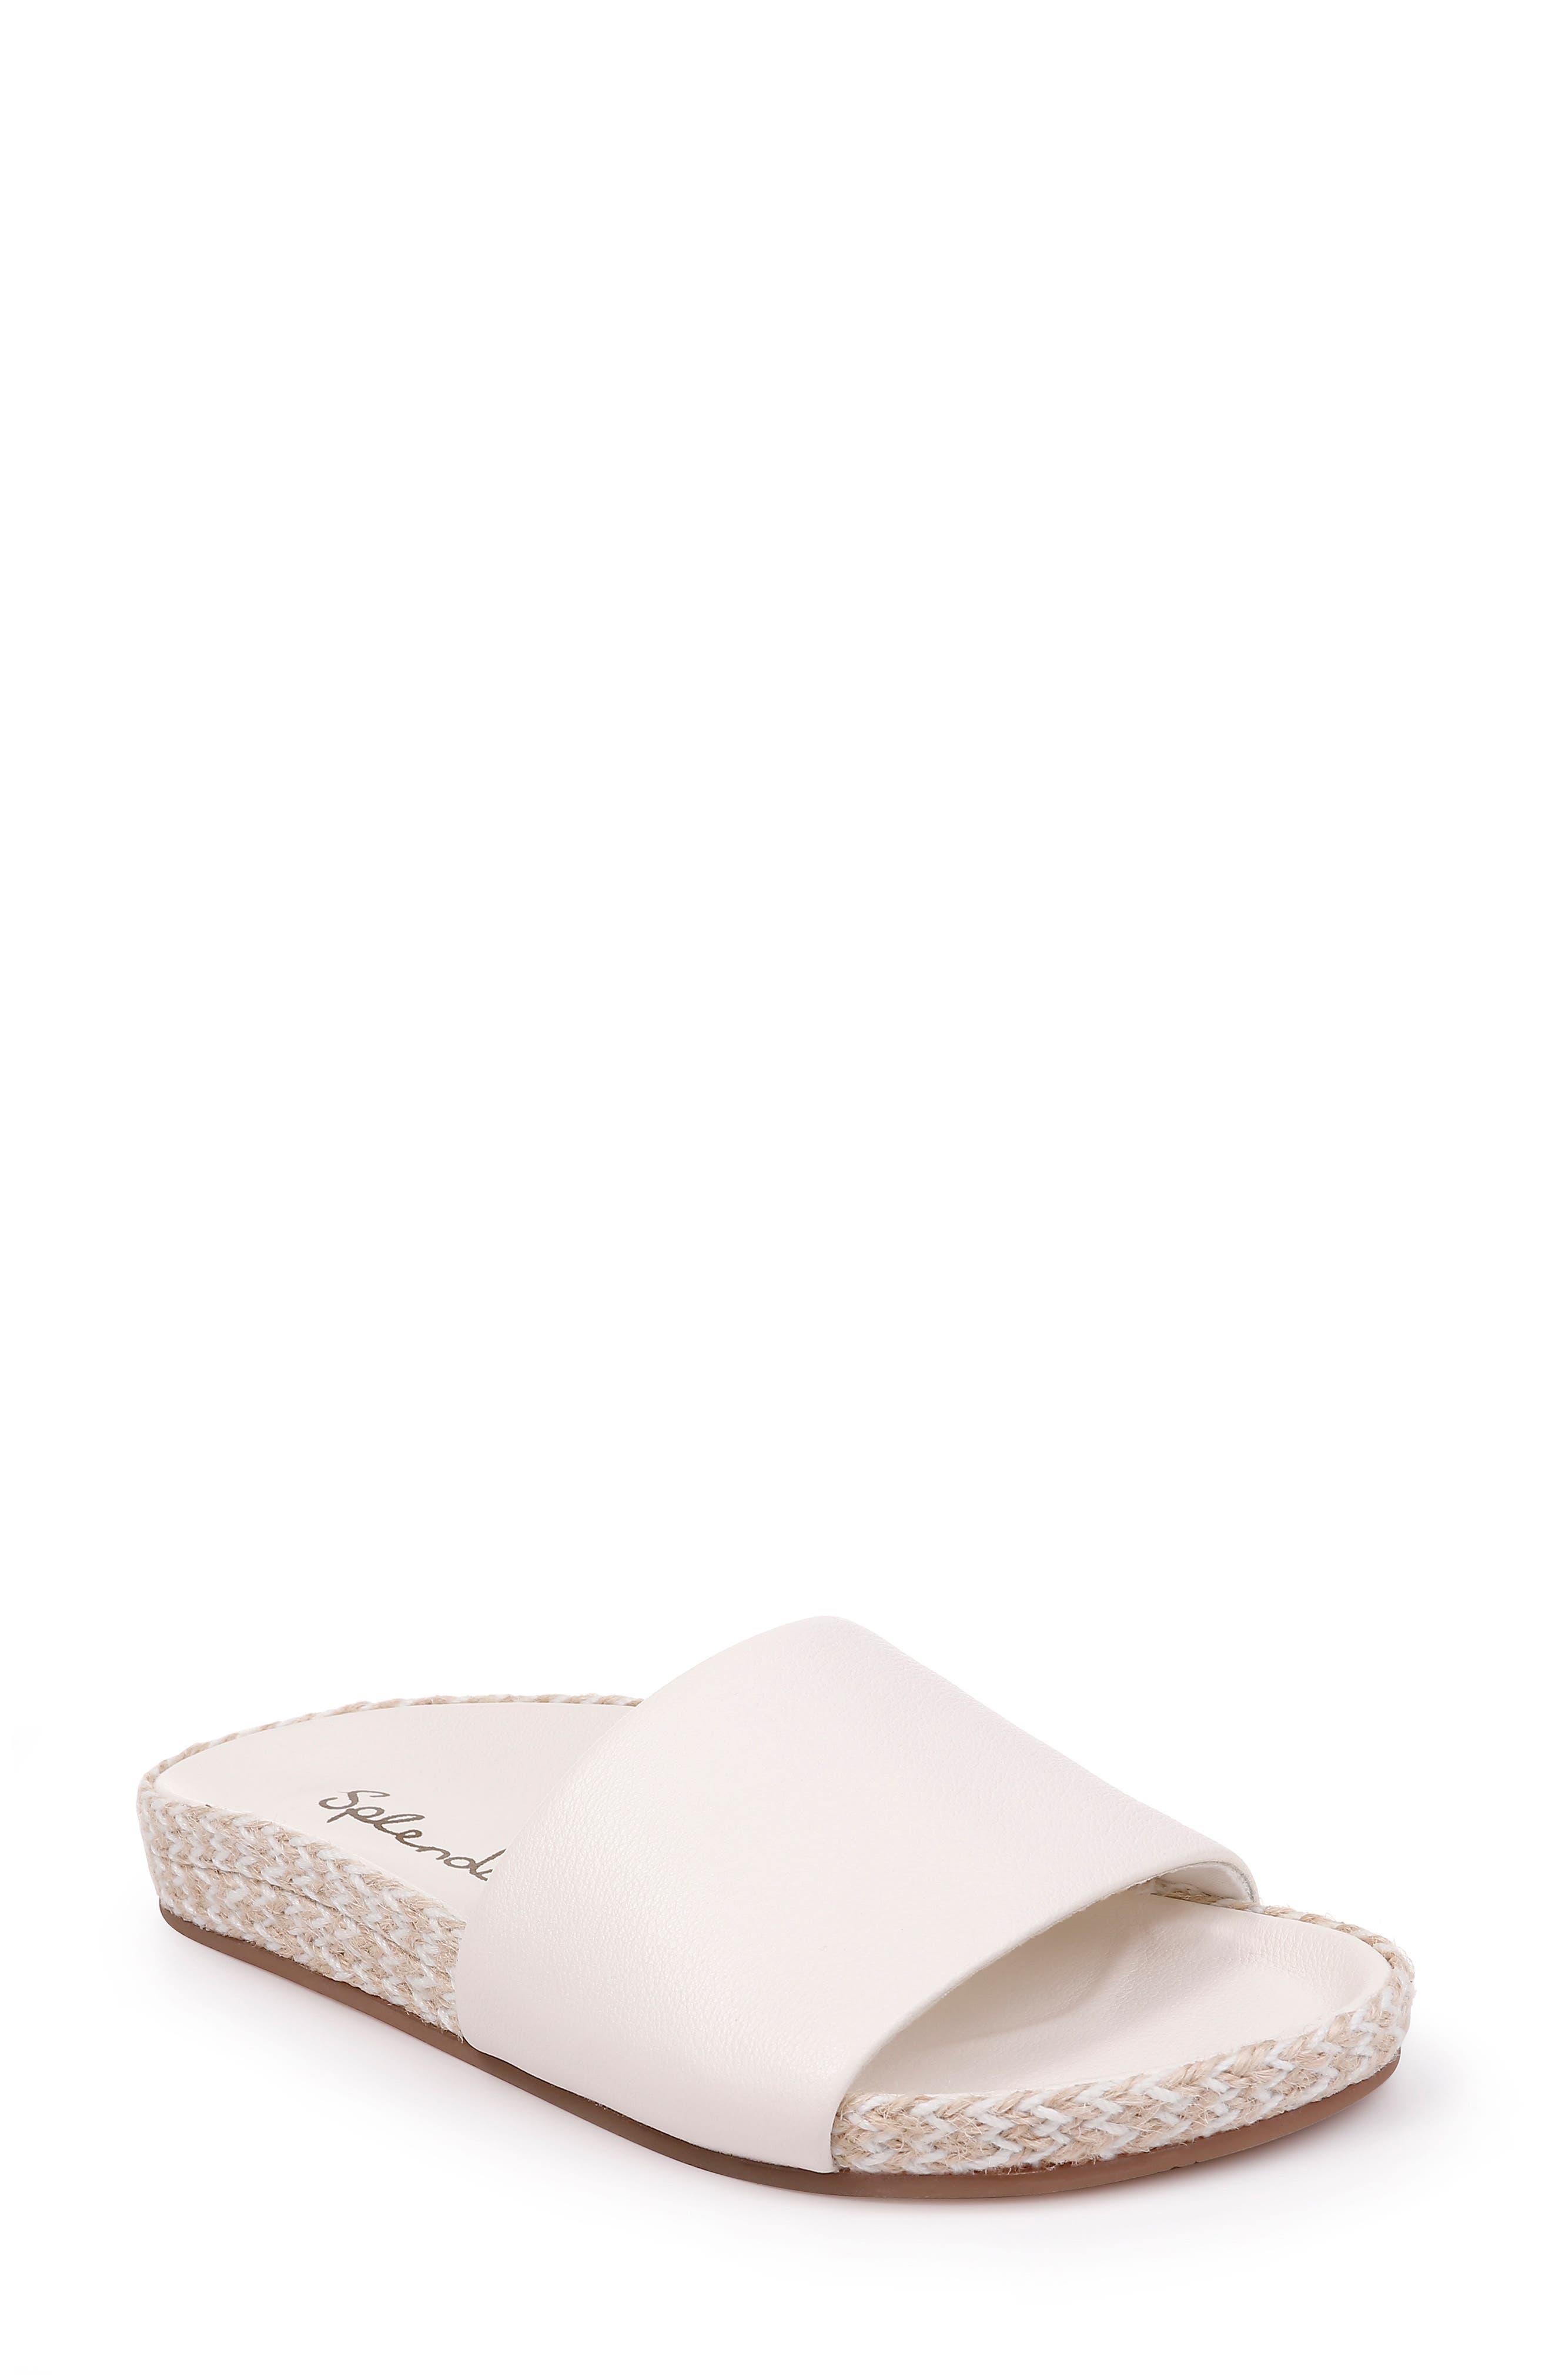 Sandford Espadrille Slide Sandal,                             Main thumbnail 1, color,                             OFF WHITE LEATHER